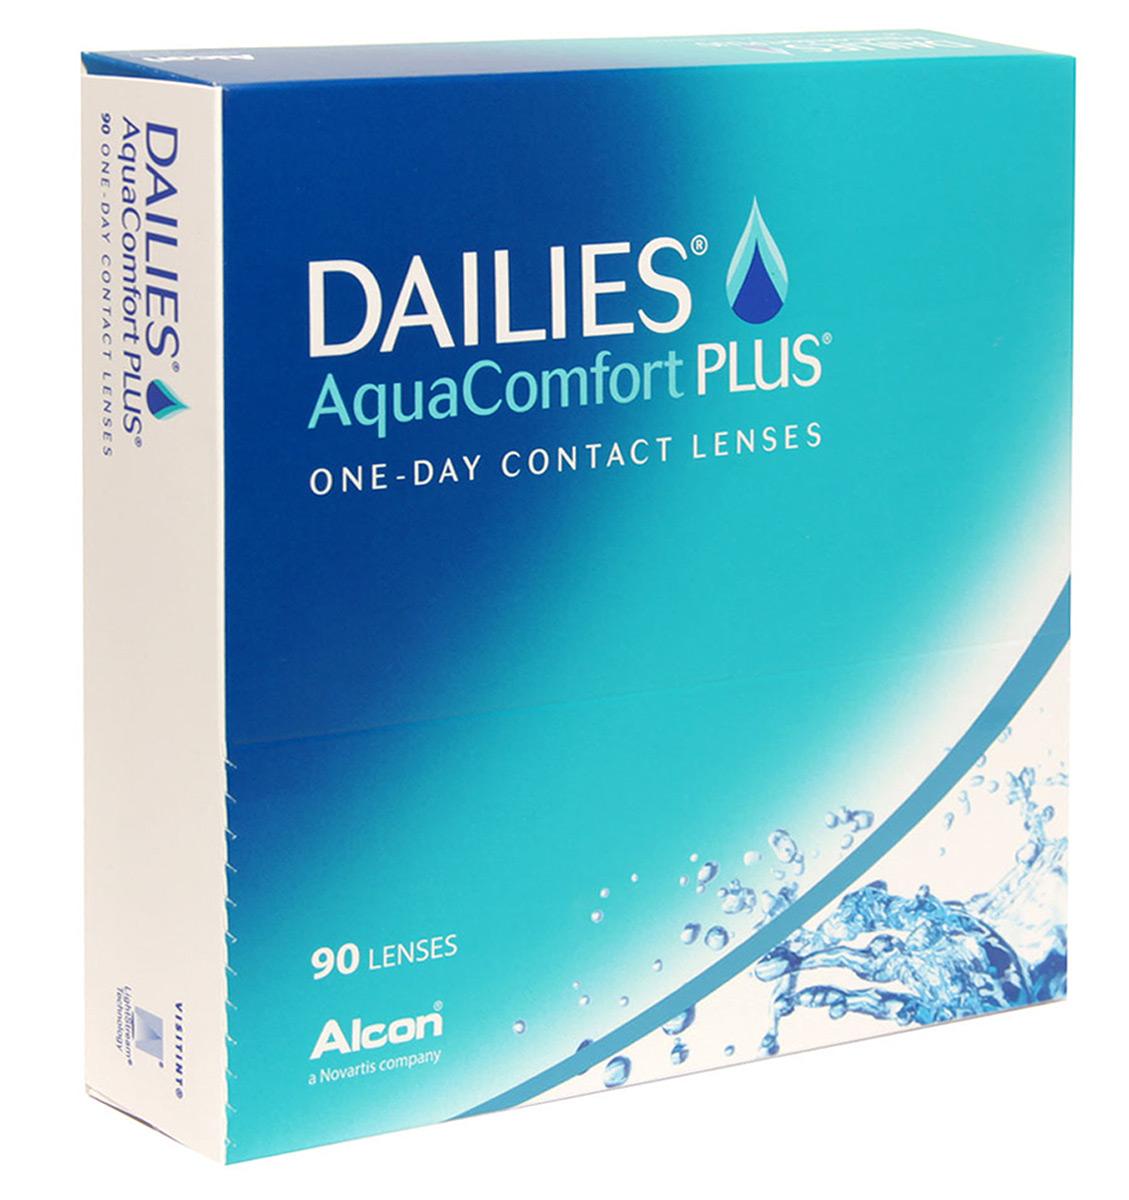 Alcon-CIBA Vision контактные линзы Dailies AquaComfort Plus (90шт / 8.7 / 14.0 / +0.50)